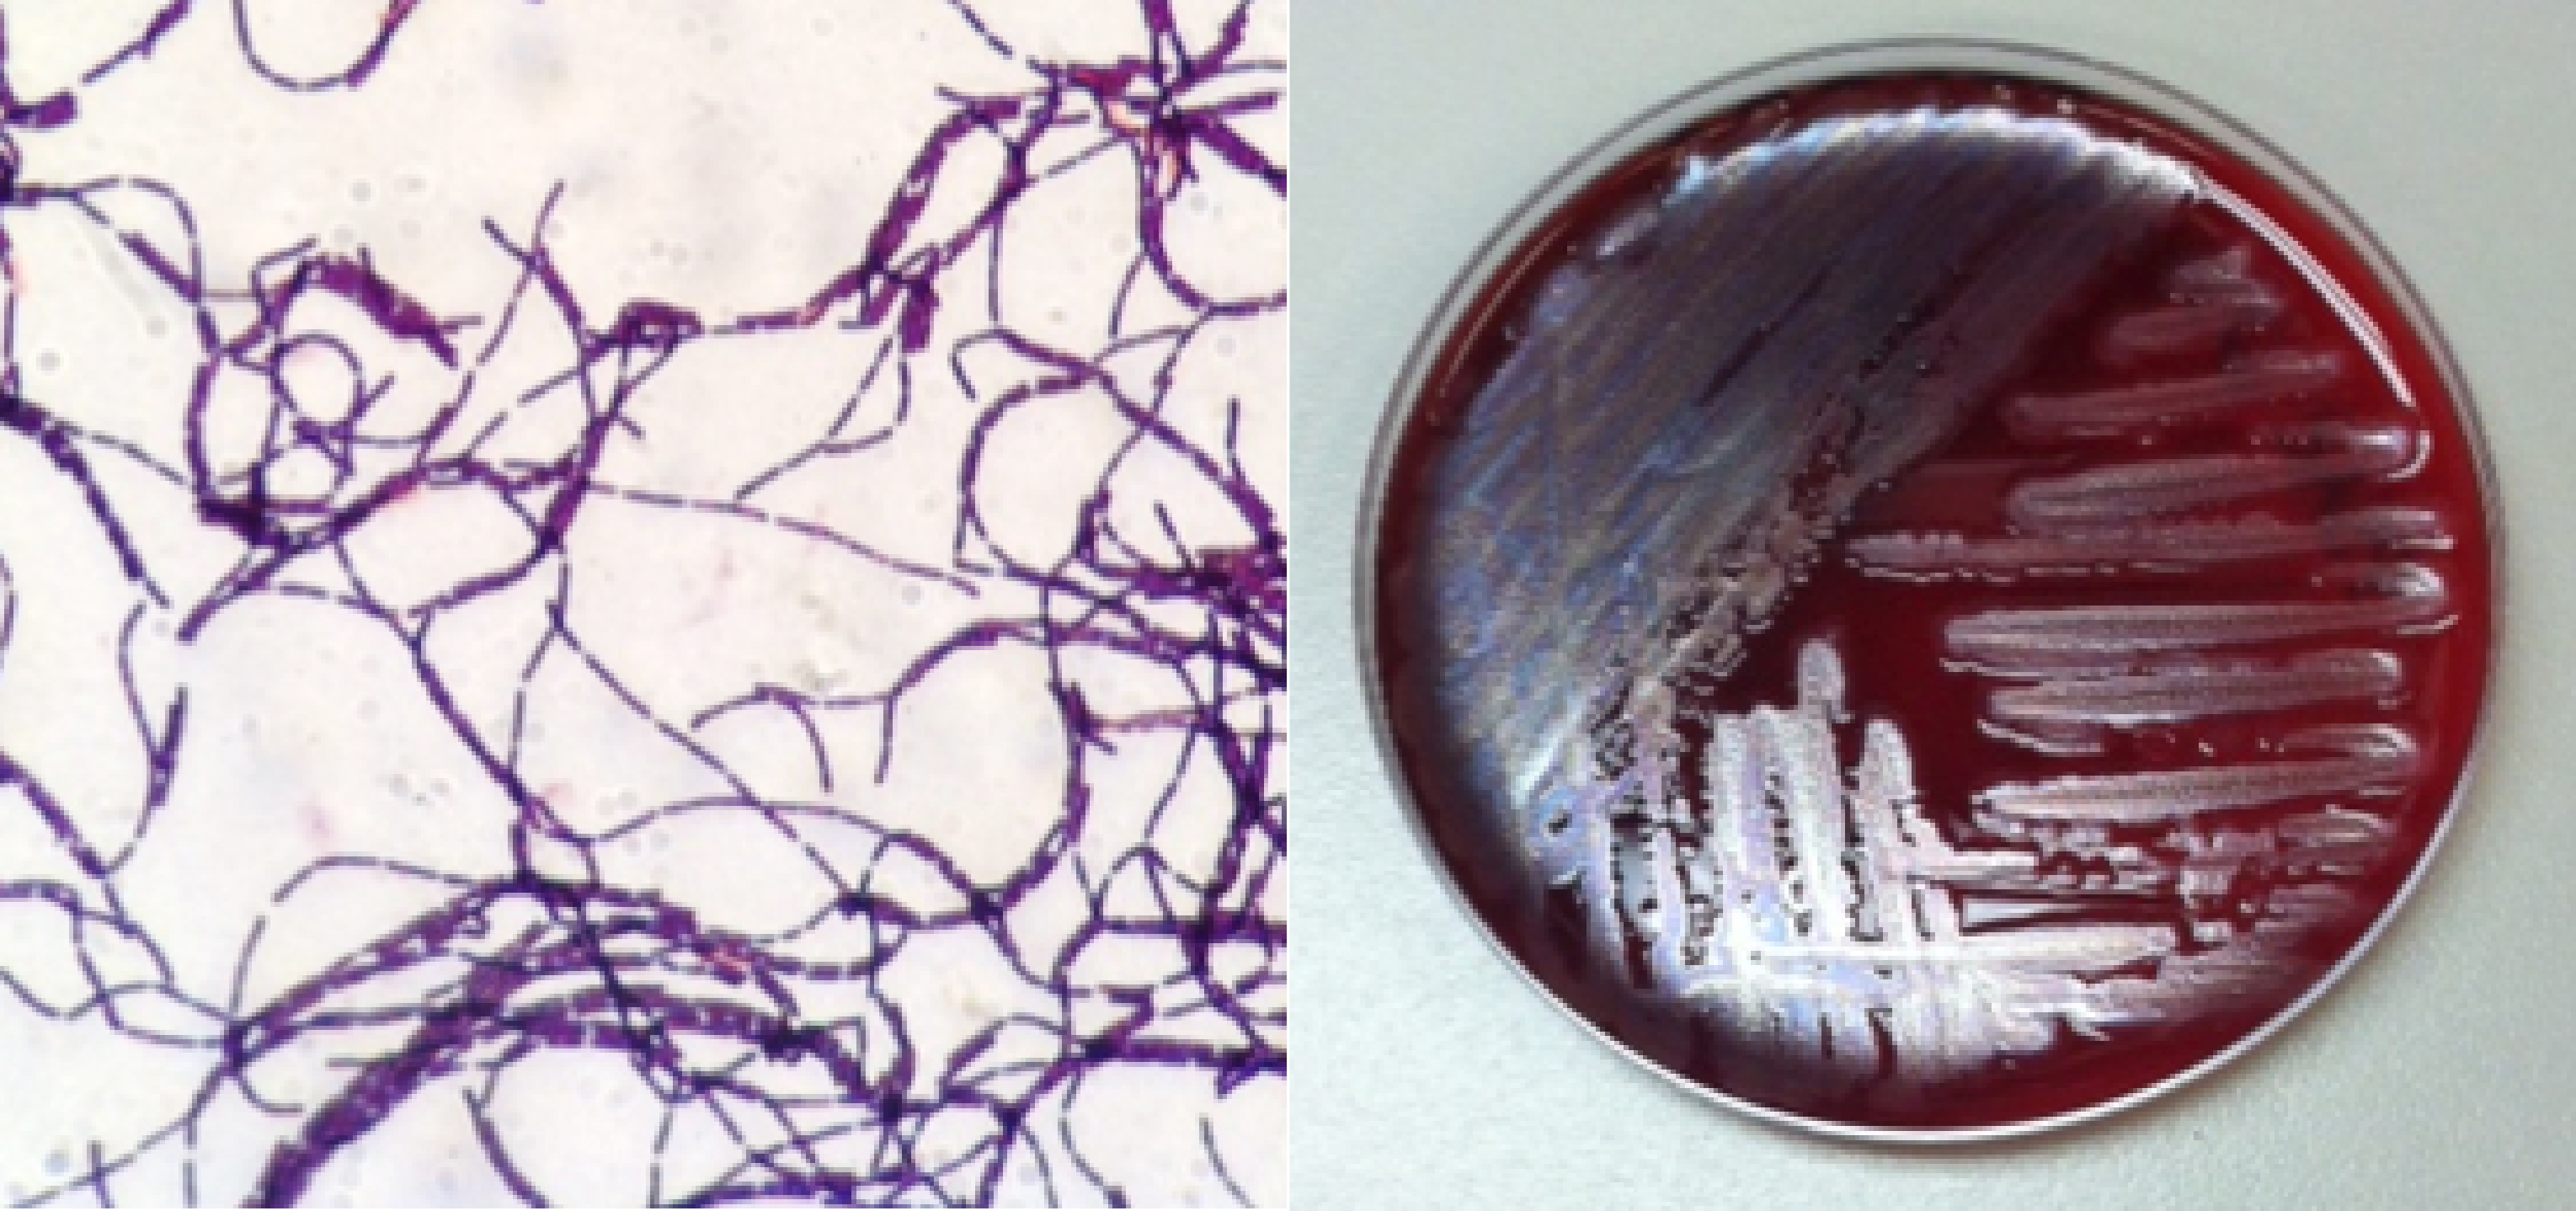 Antibiotic_Resistance_Twitter_2.png